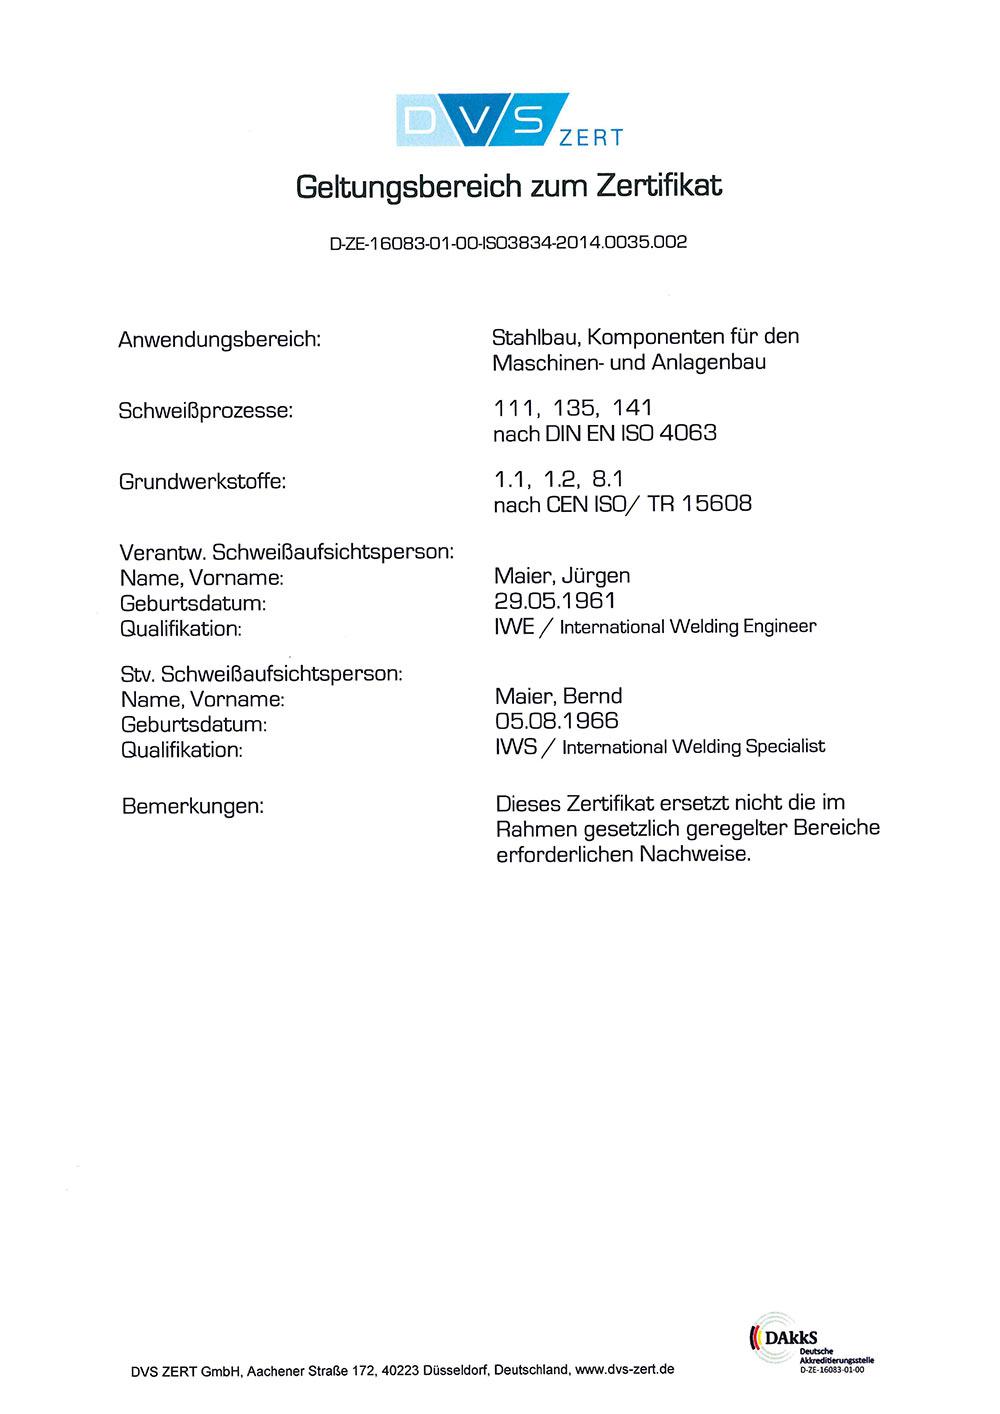 Zertifikat_3834__A_Maier_GmbH_bis_11_2019-1_Seite2